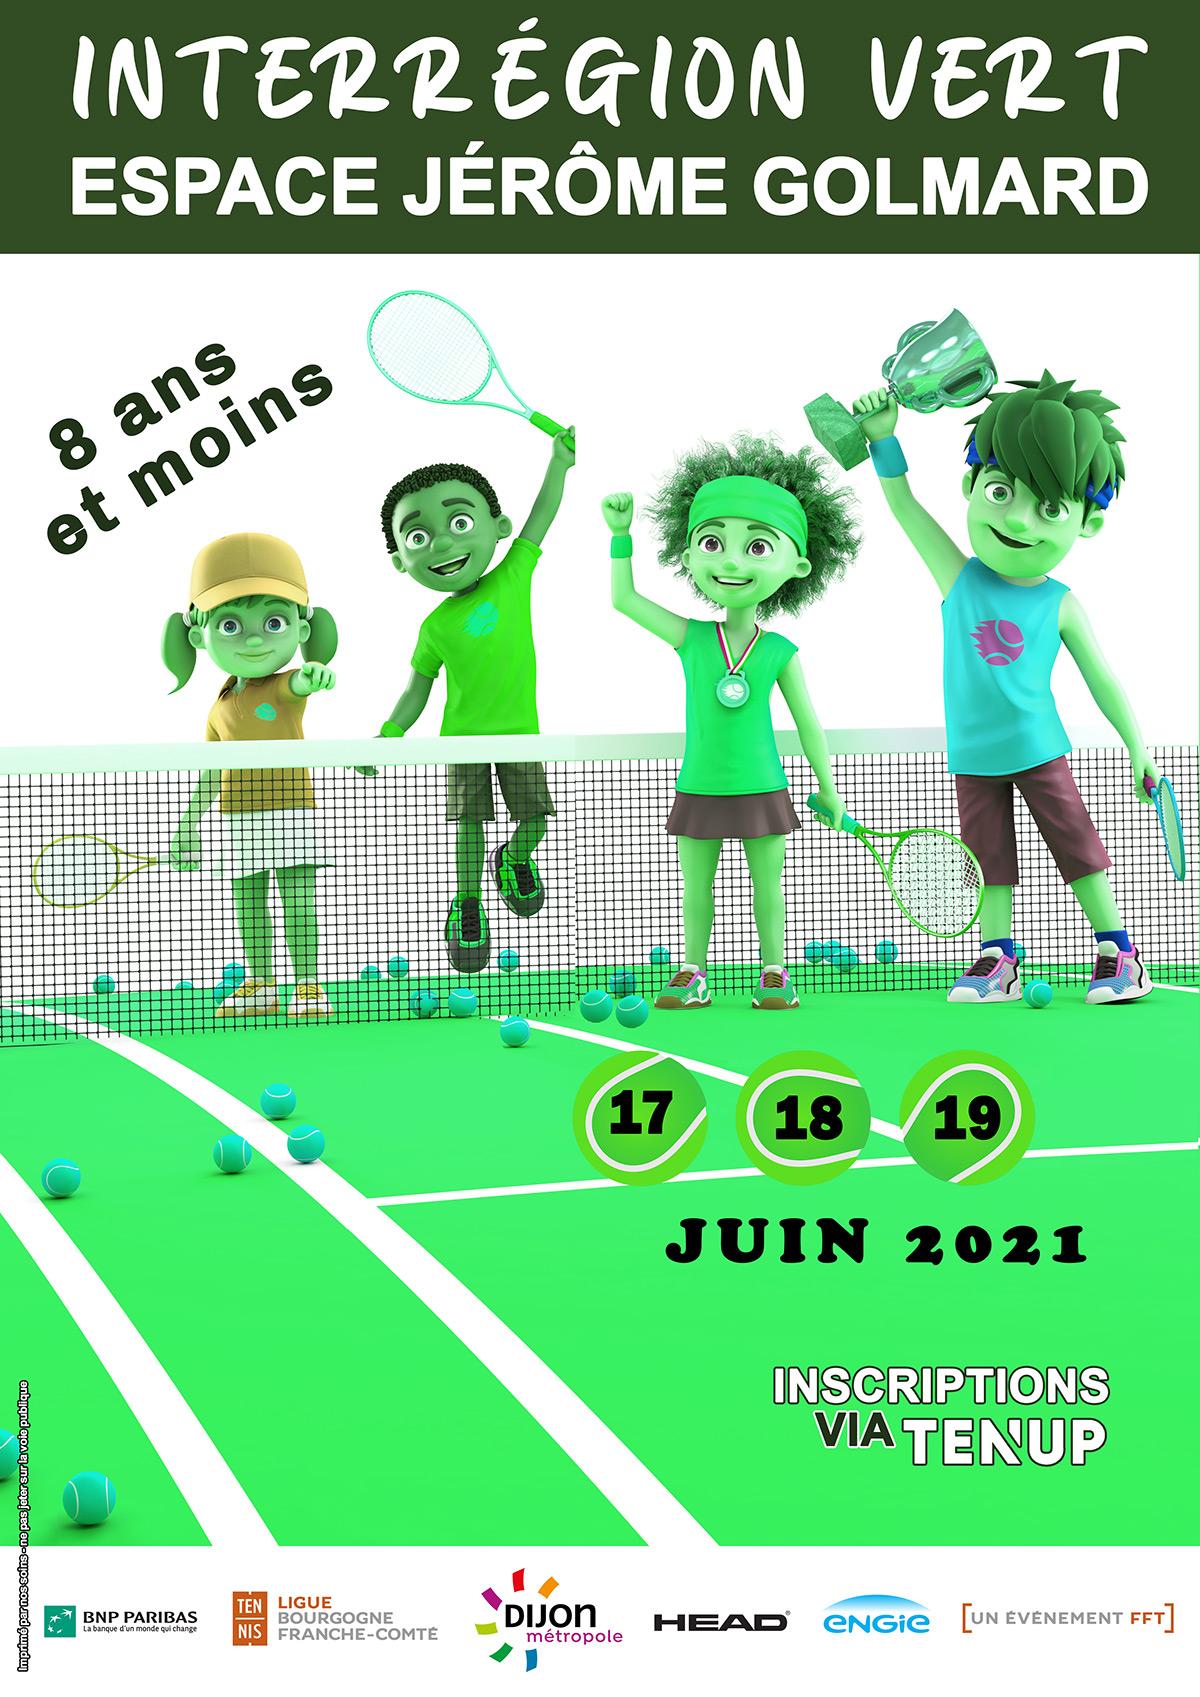 Interregion Vert 2021 Ligue Bourgogne-Franche-Comté de Tennis